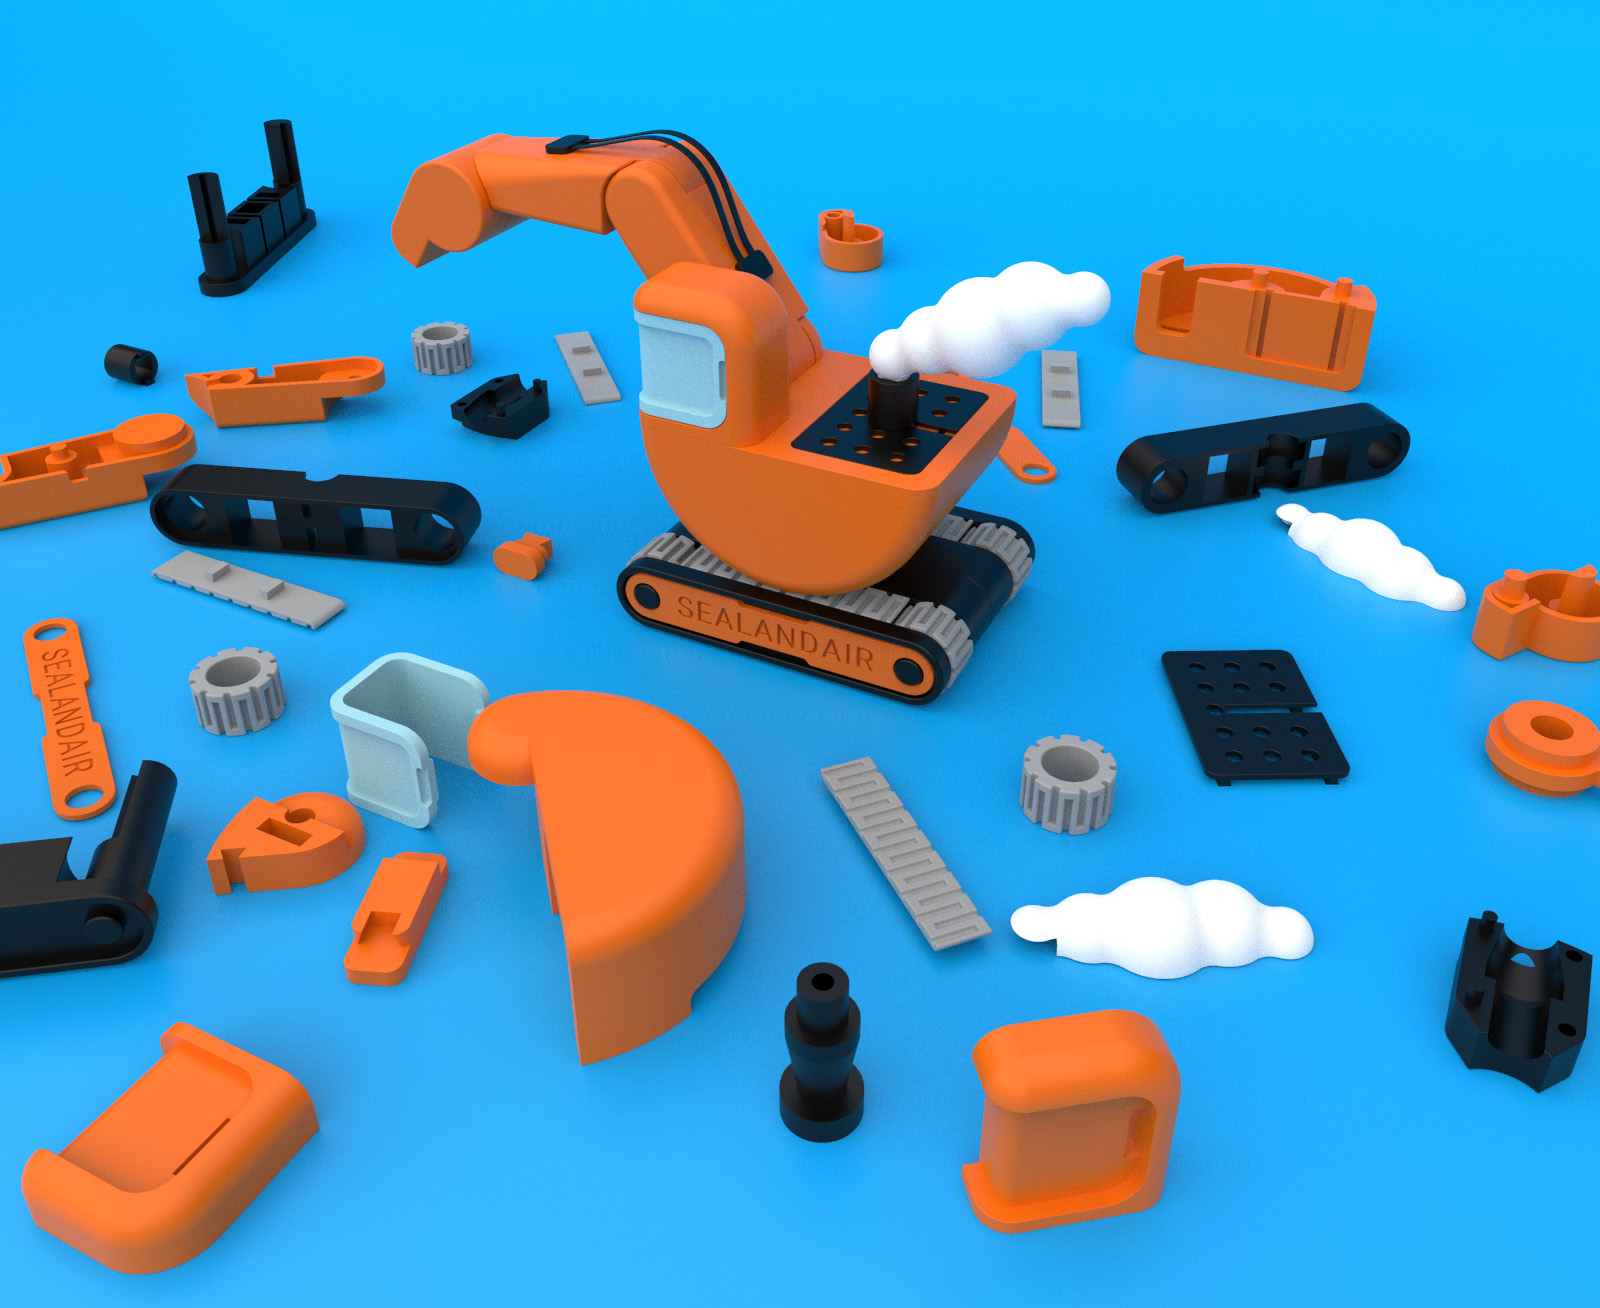 MiniMax Super Digger - Dig up your desktop